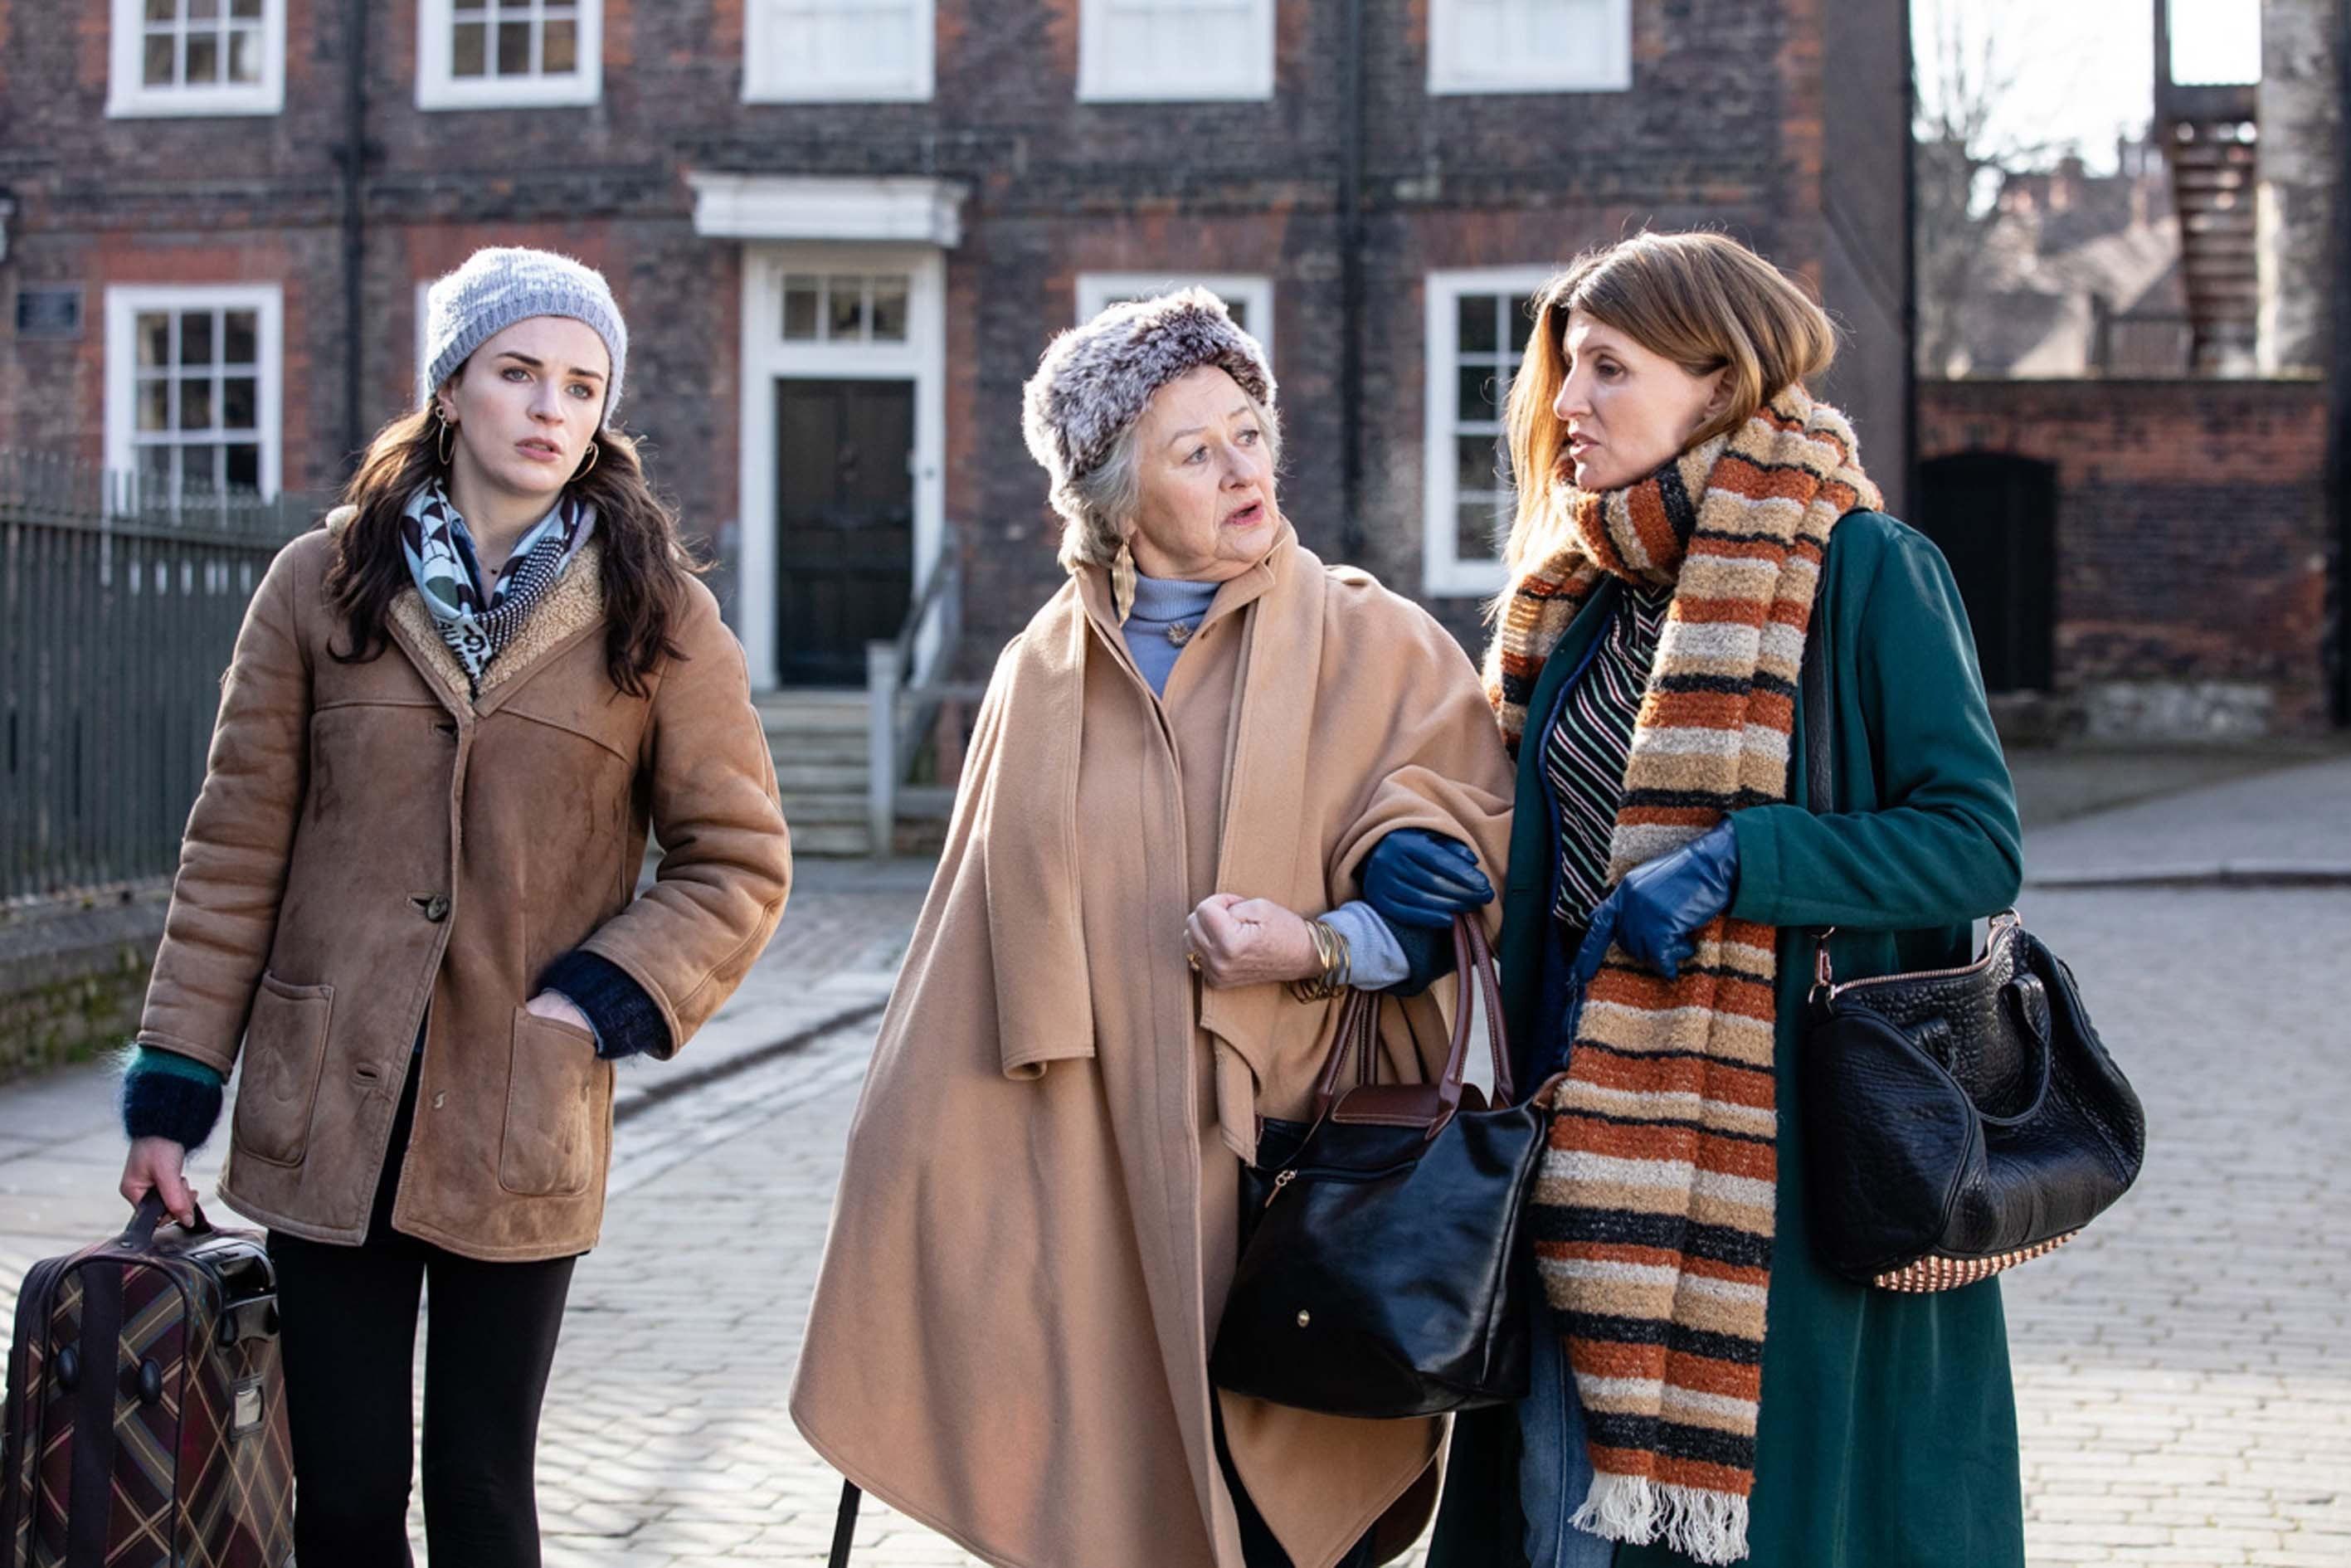 Aisling Bea, Sorcha Cusack, and Sharon Horgan (Season 1, Episode 104)